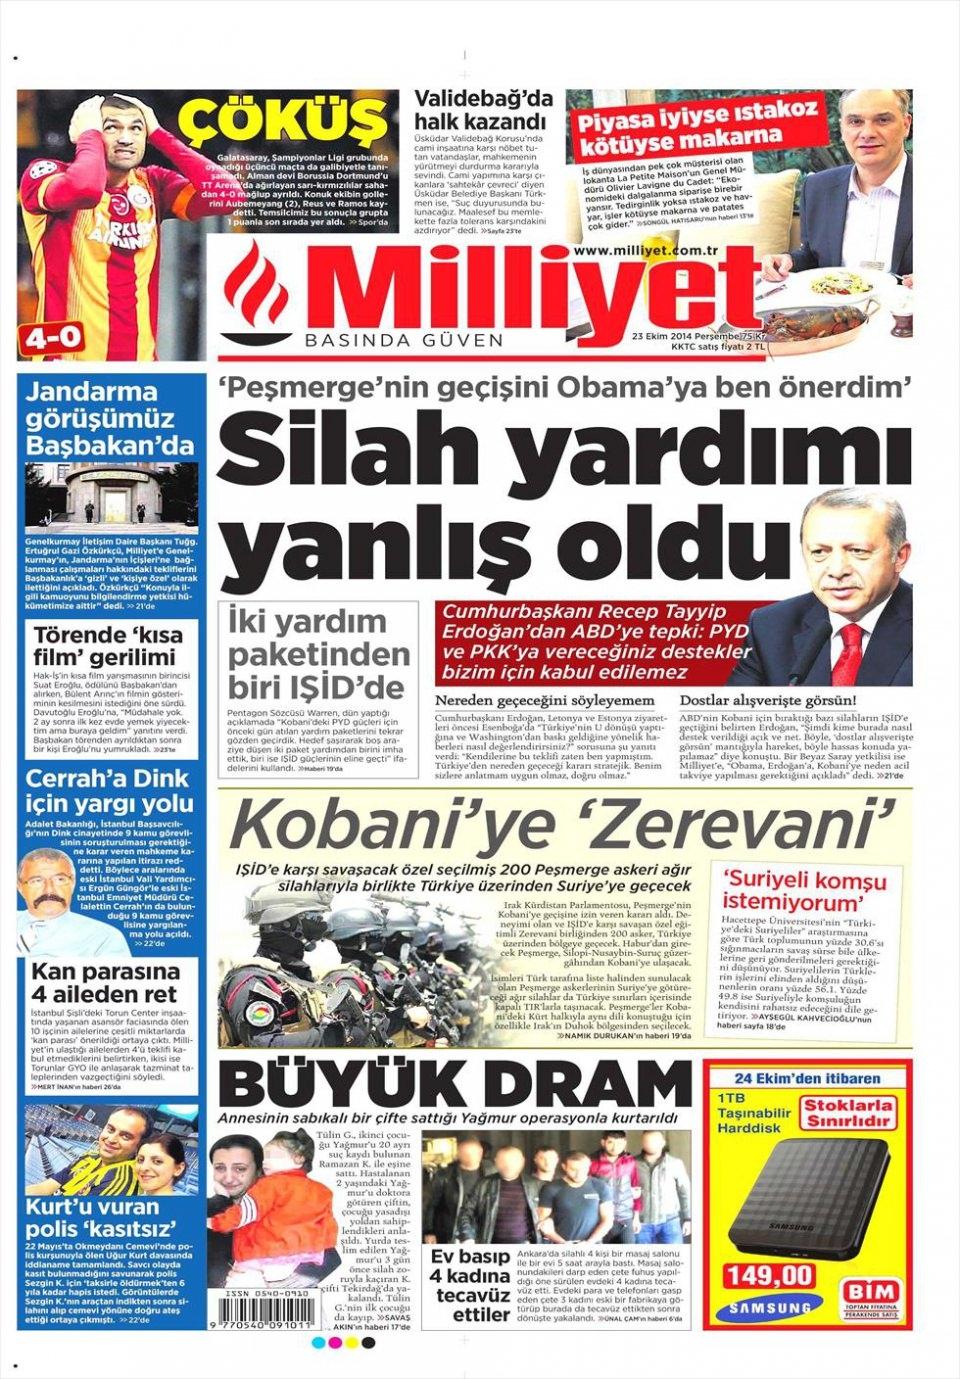 23 Ekim 2014 gazete manşetleri 12